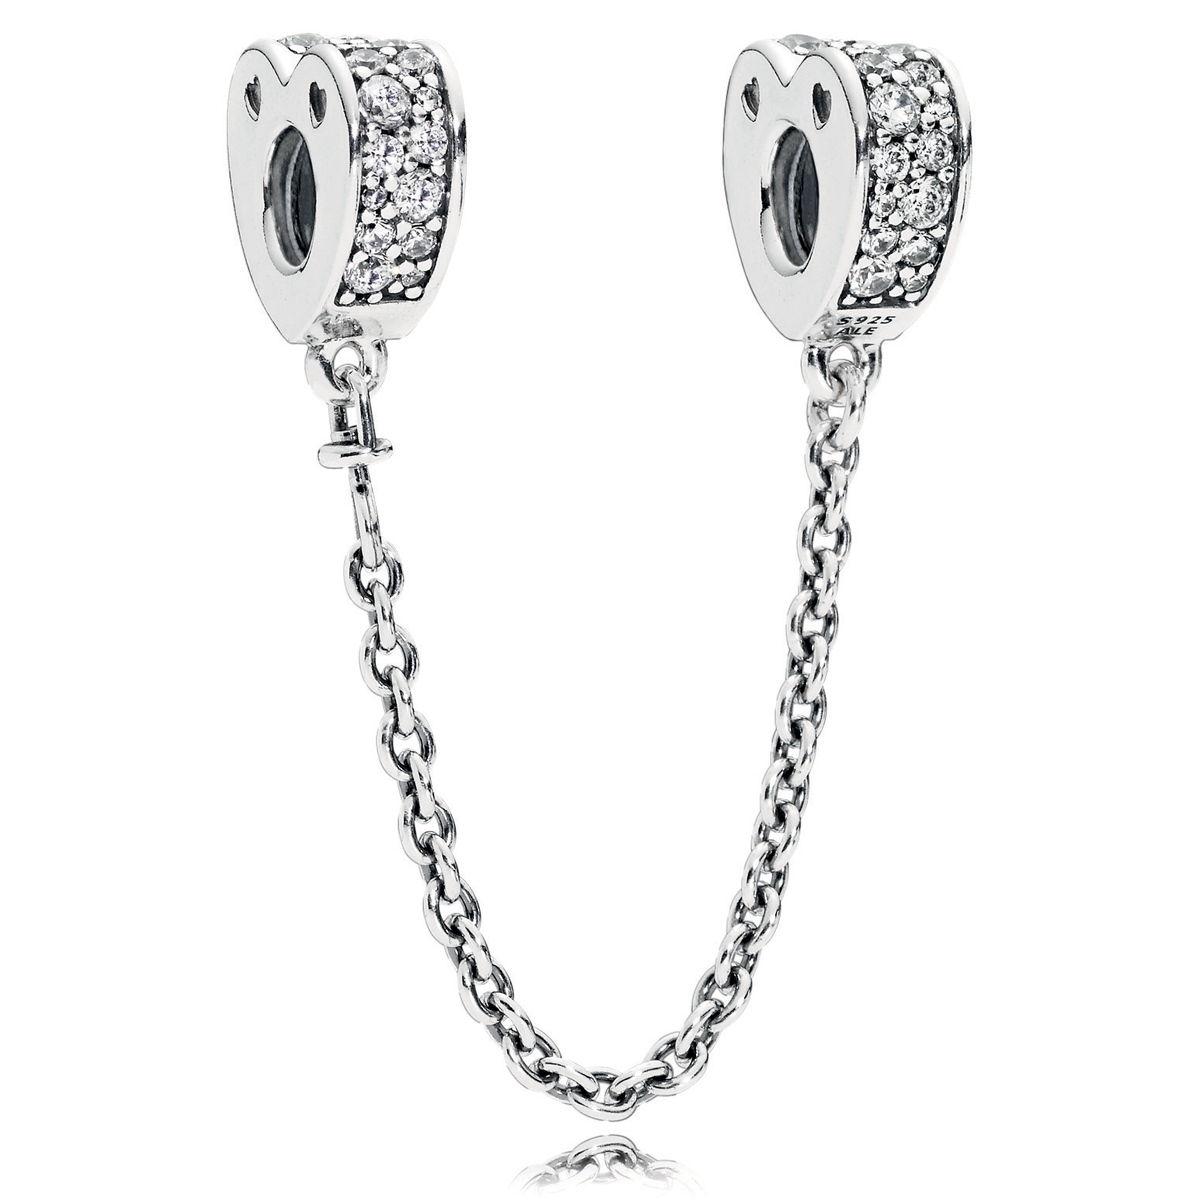 Sparkling Moon /& Star Elegance Arcs of Love Safety Chain ELEGANCE Insignia S925